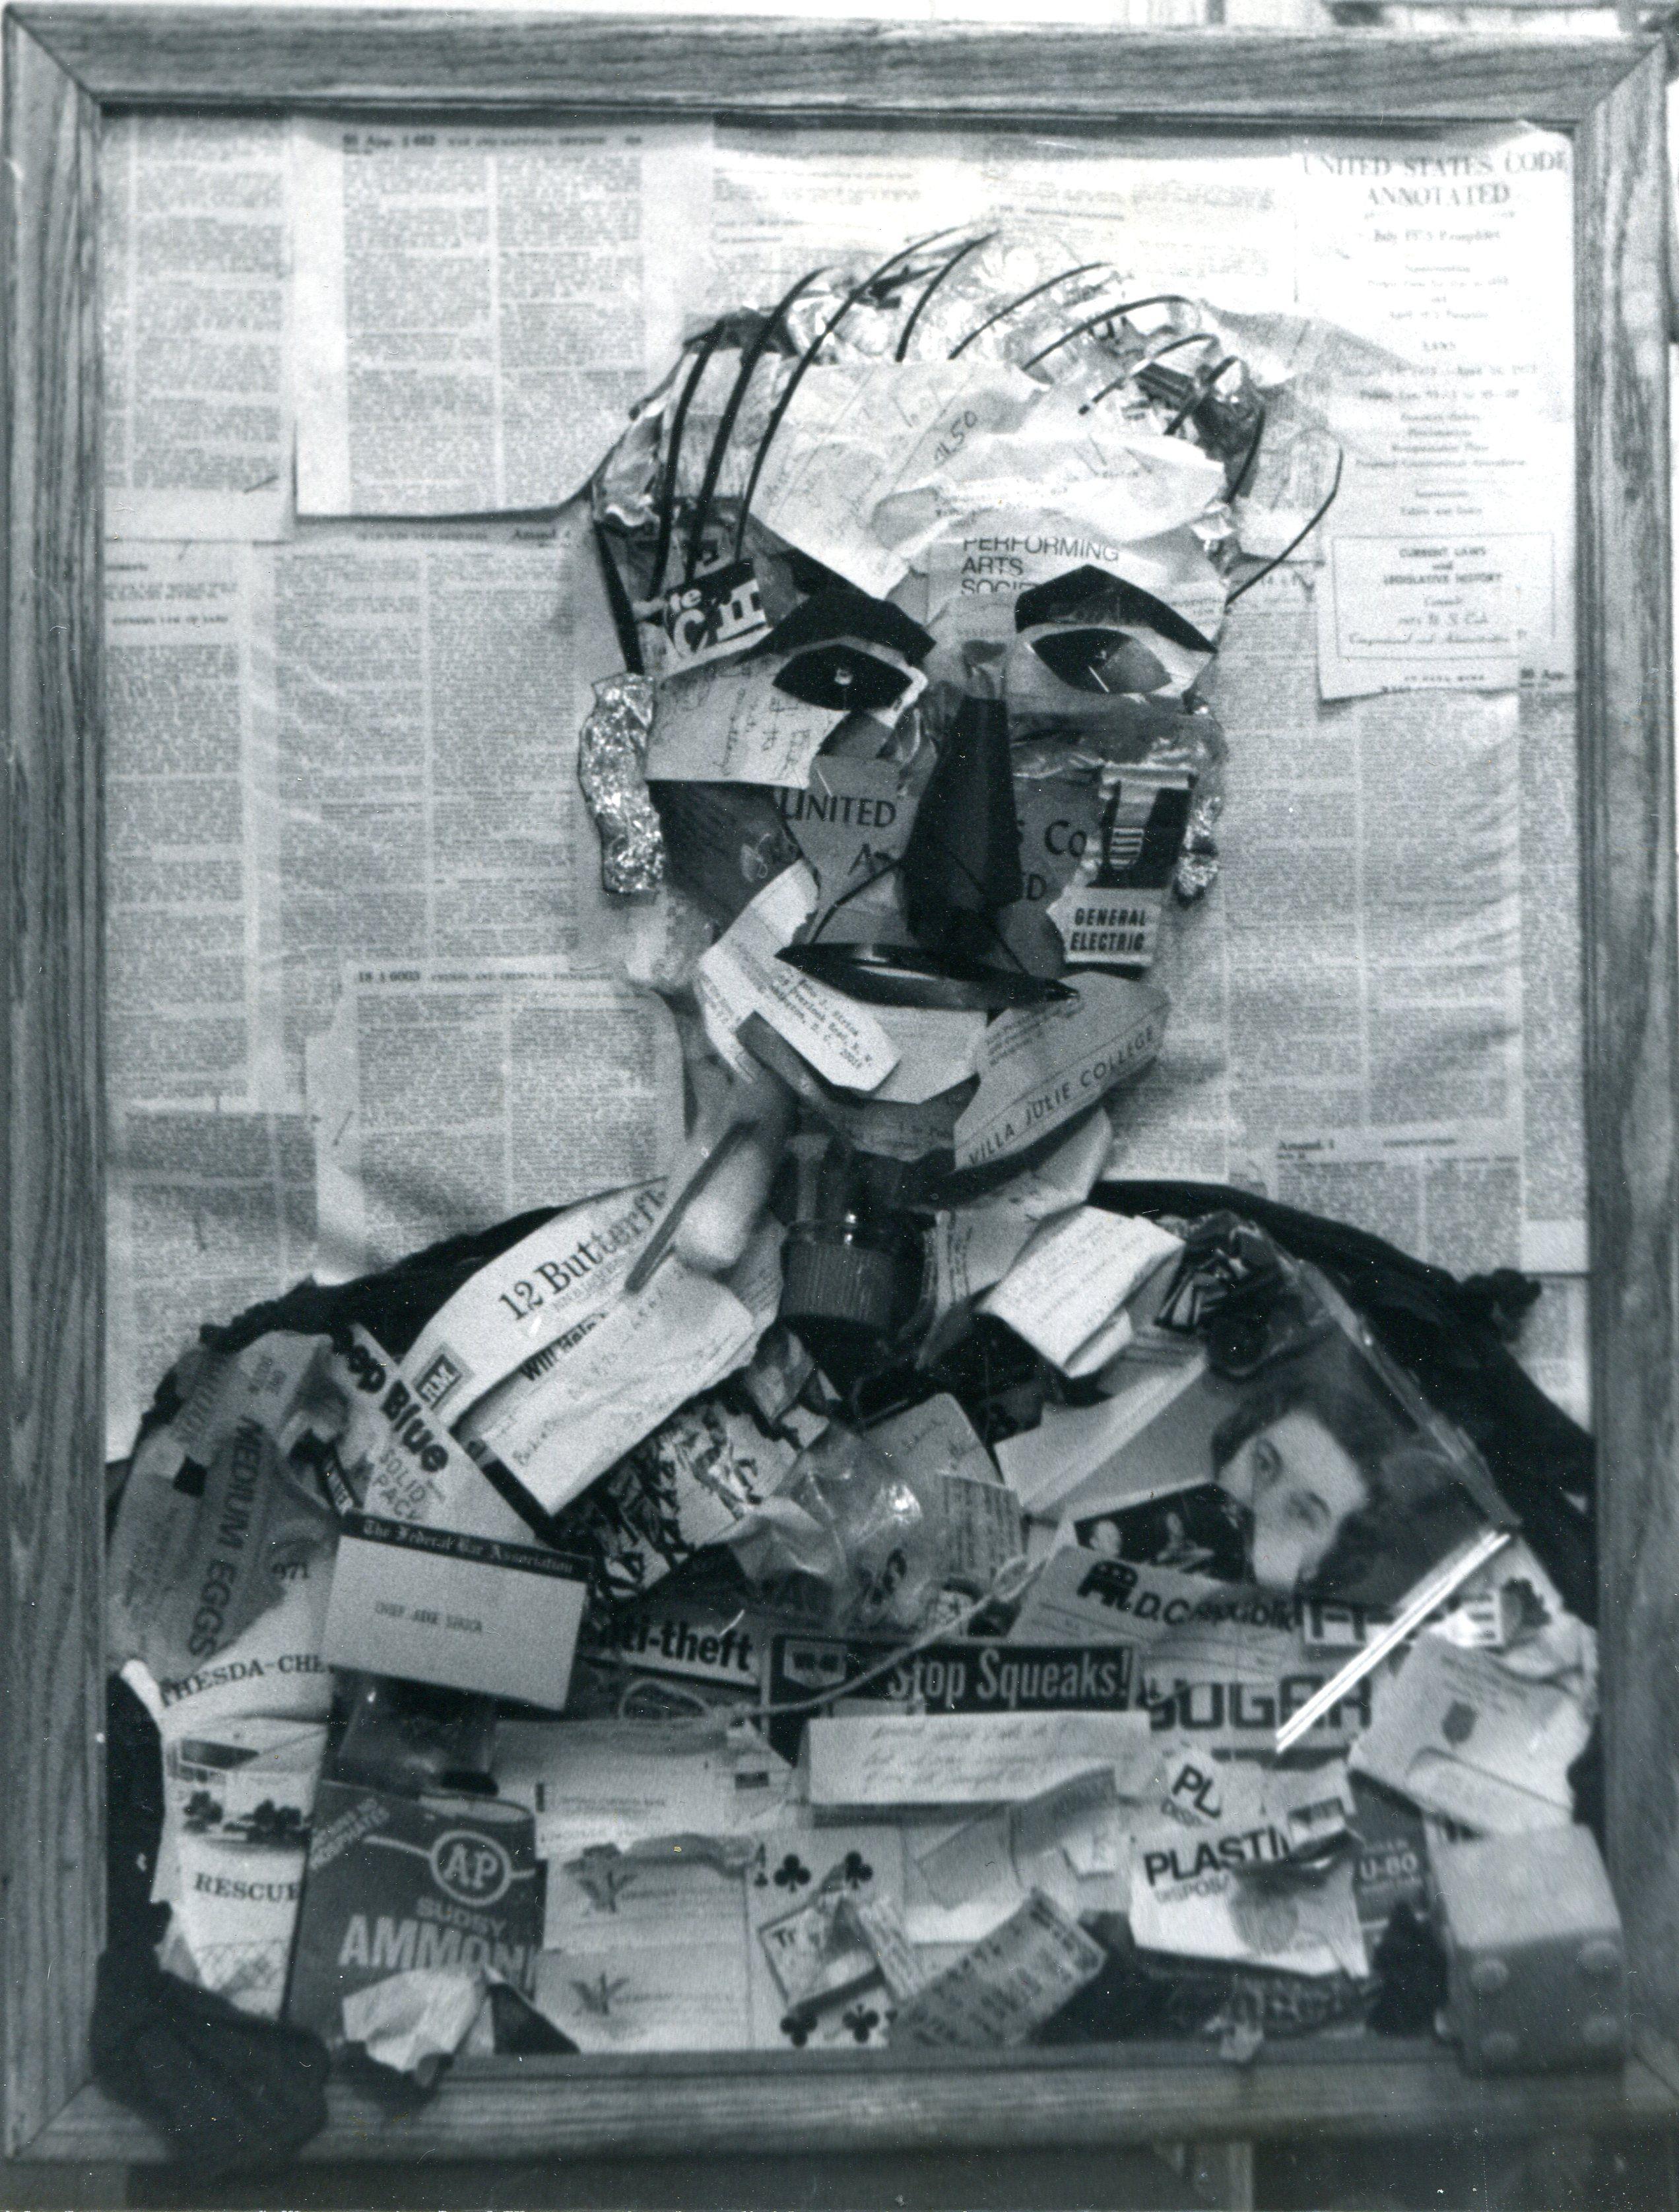 Garbart portrait of John Sirica - Watergate hanging Judge.